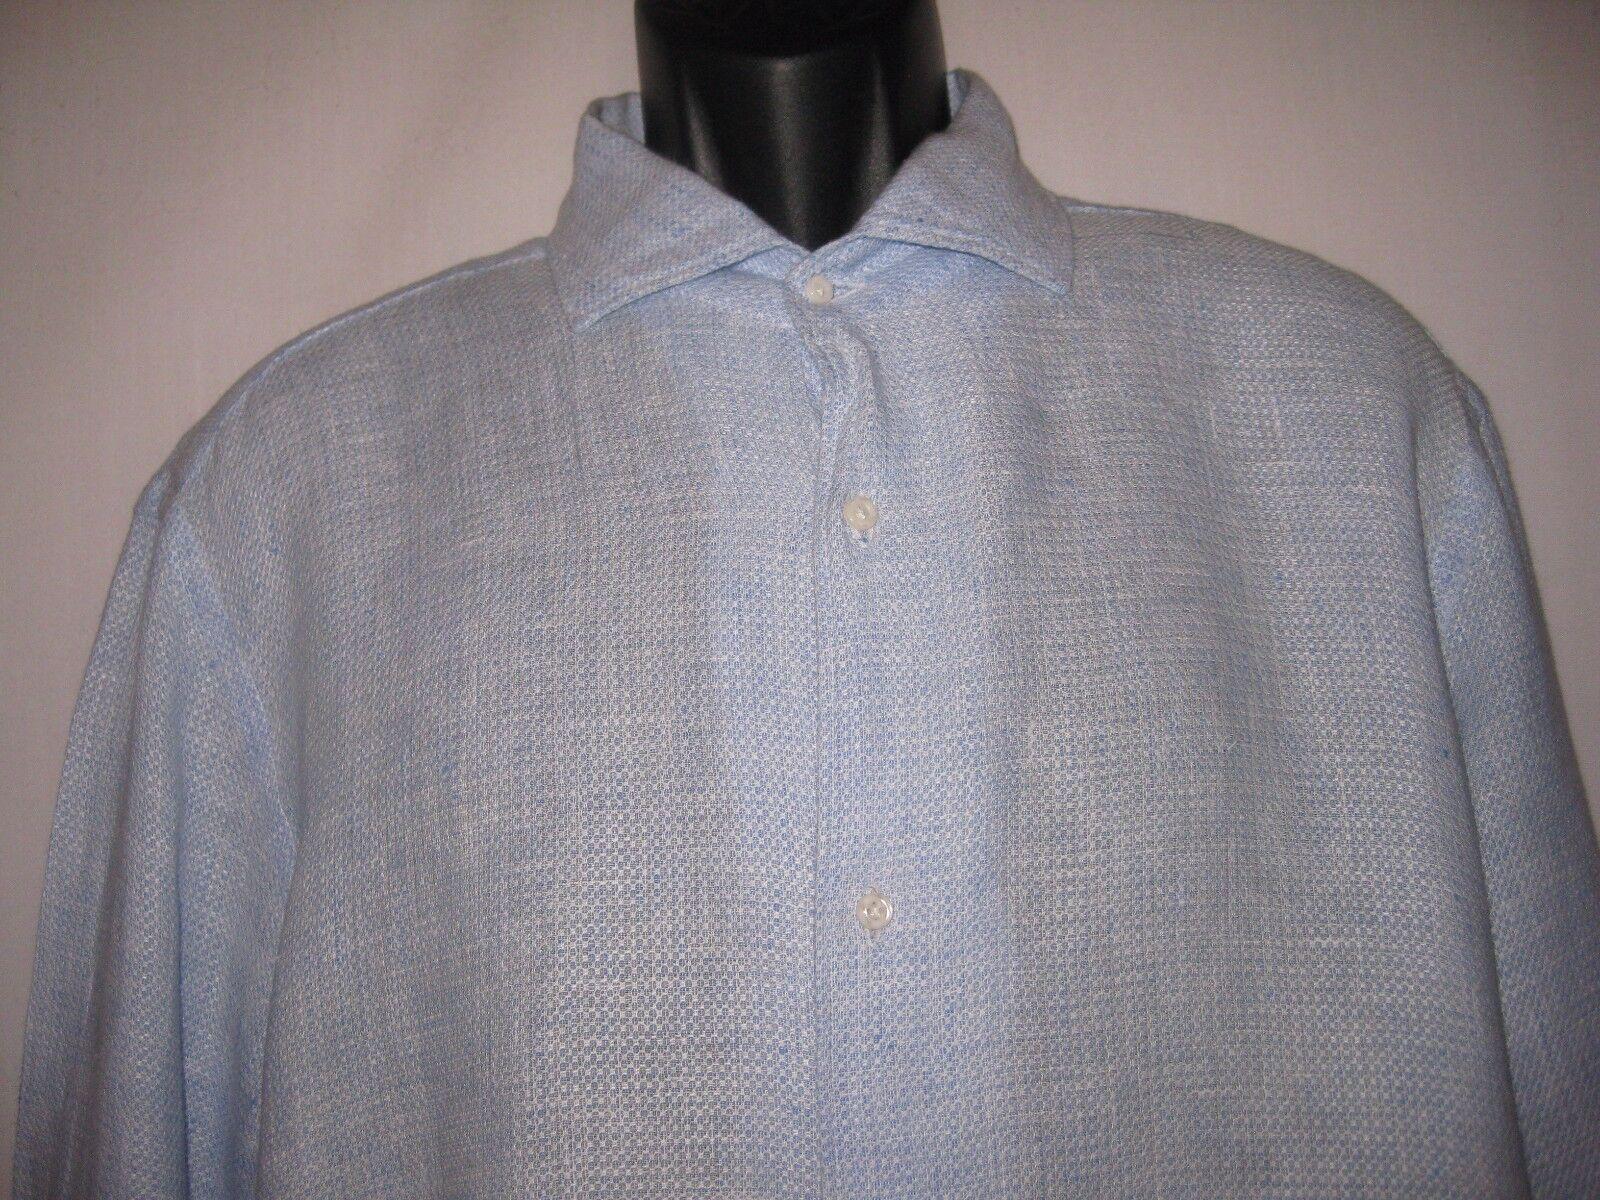 Gutteridge dal 1878 Dress Shirt 100% Linen Größe 45 18  Lt Blau Stylish  165